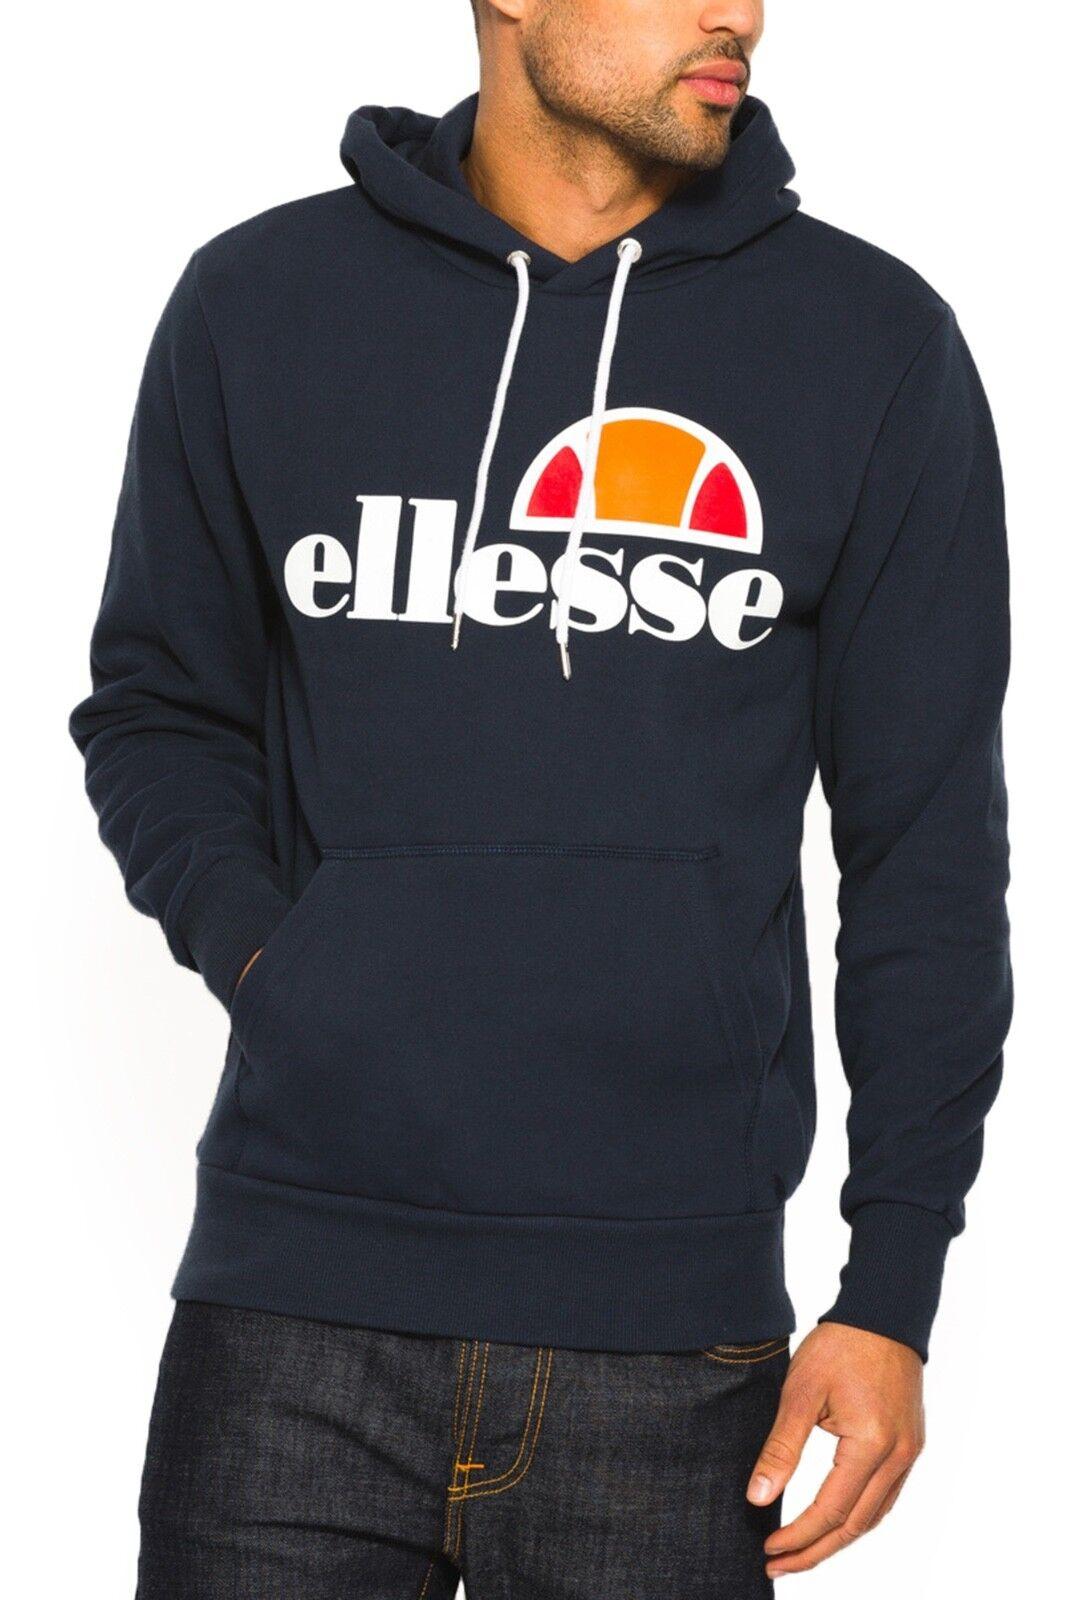 Ellesse  Herren Cotton Overhead Gottero Hooded Sweatshirt Top Dress Blau Hoodie